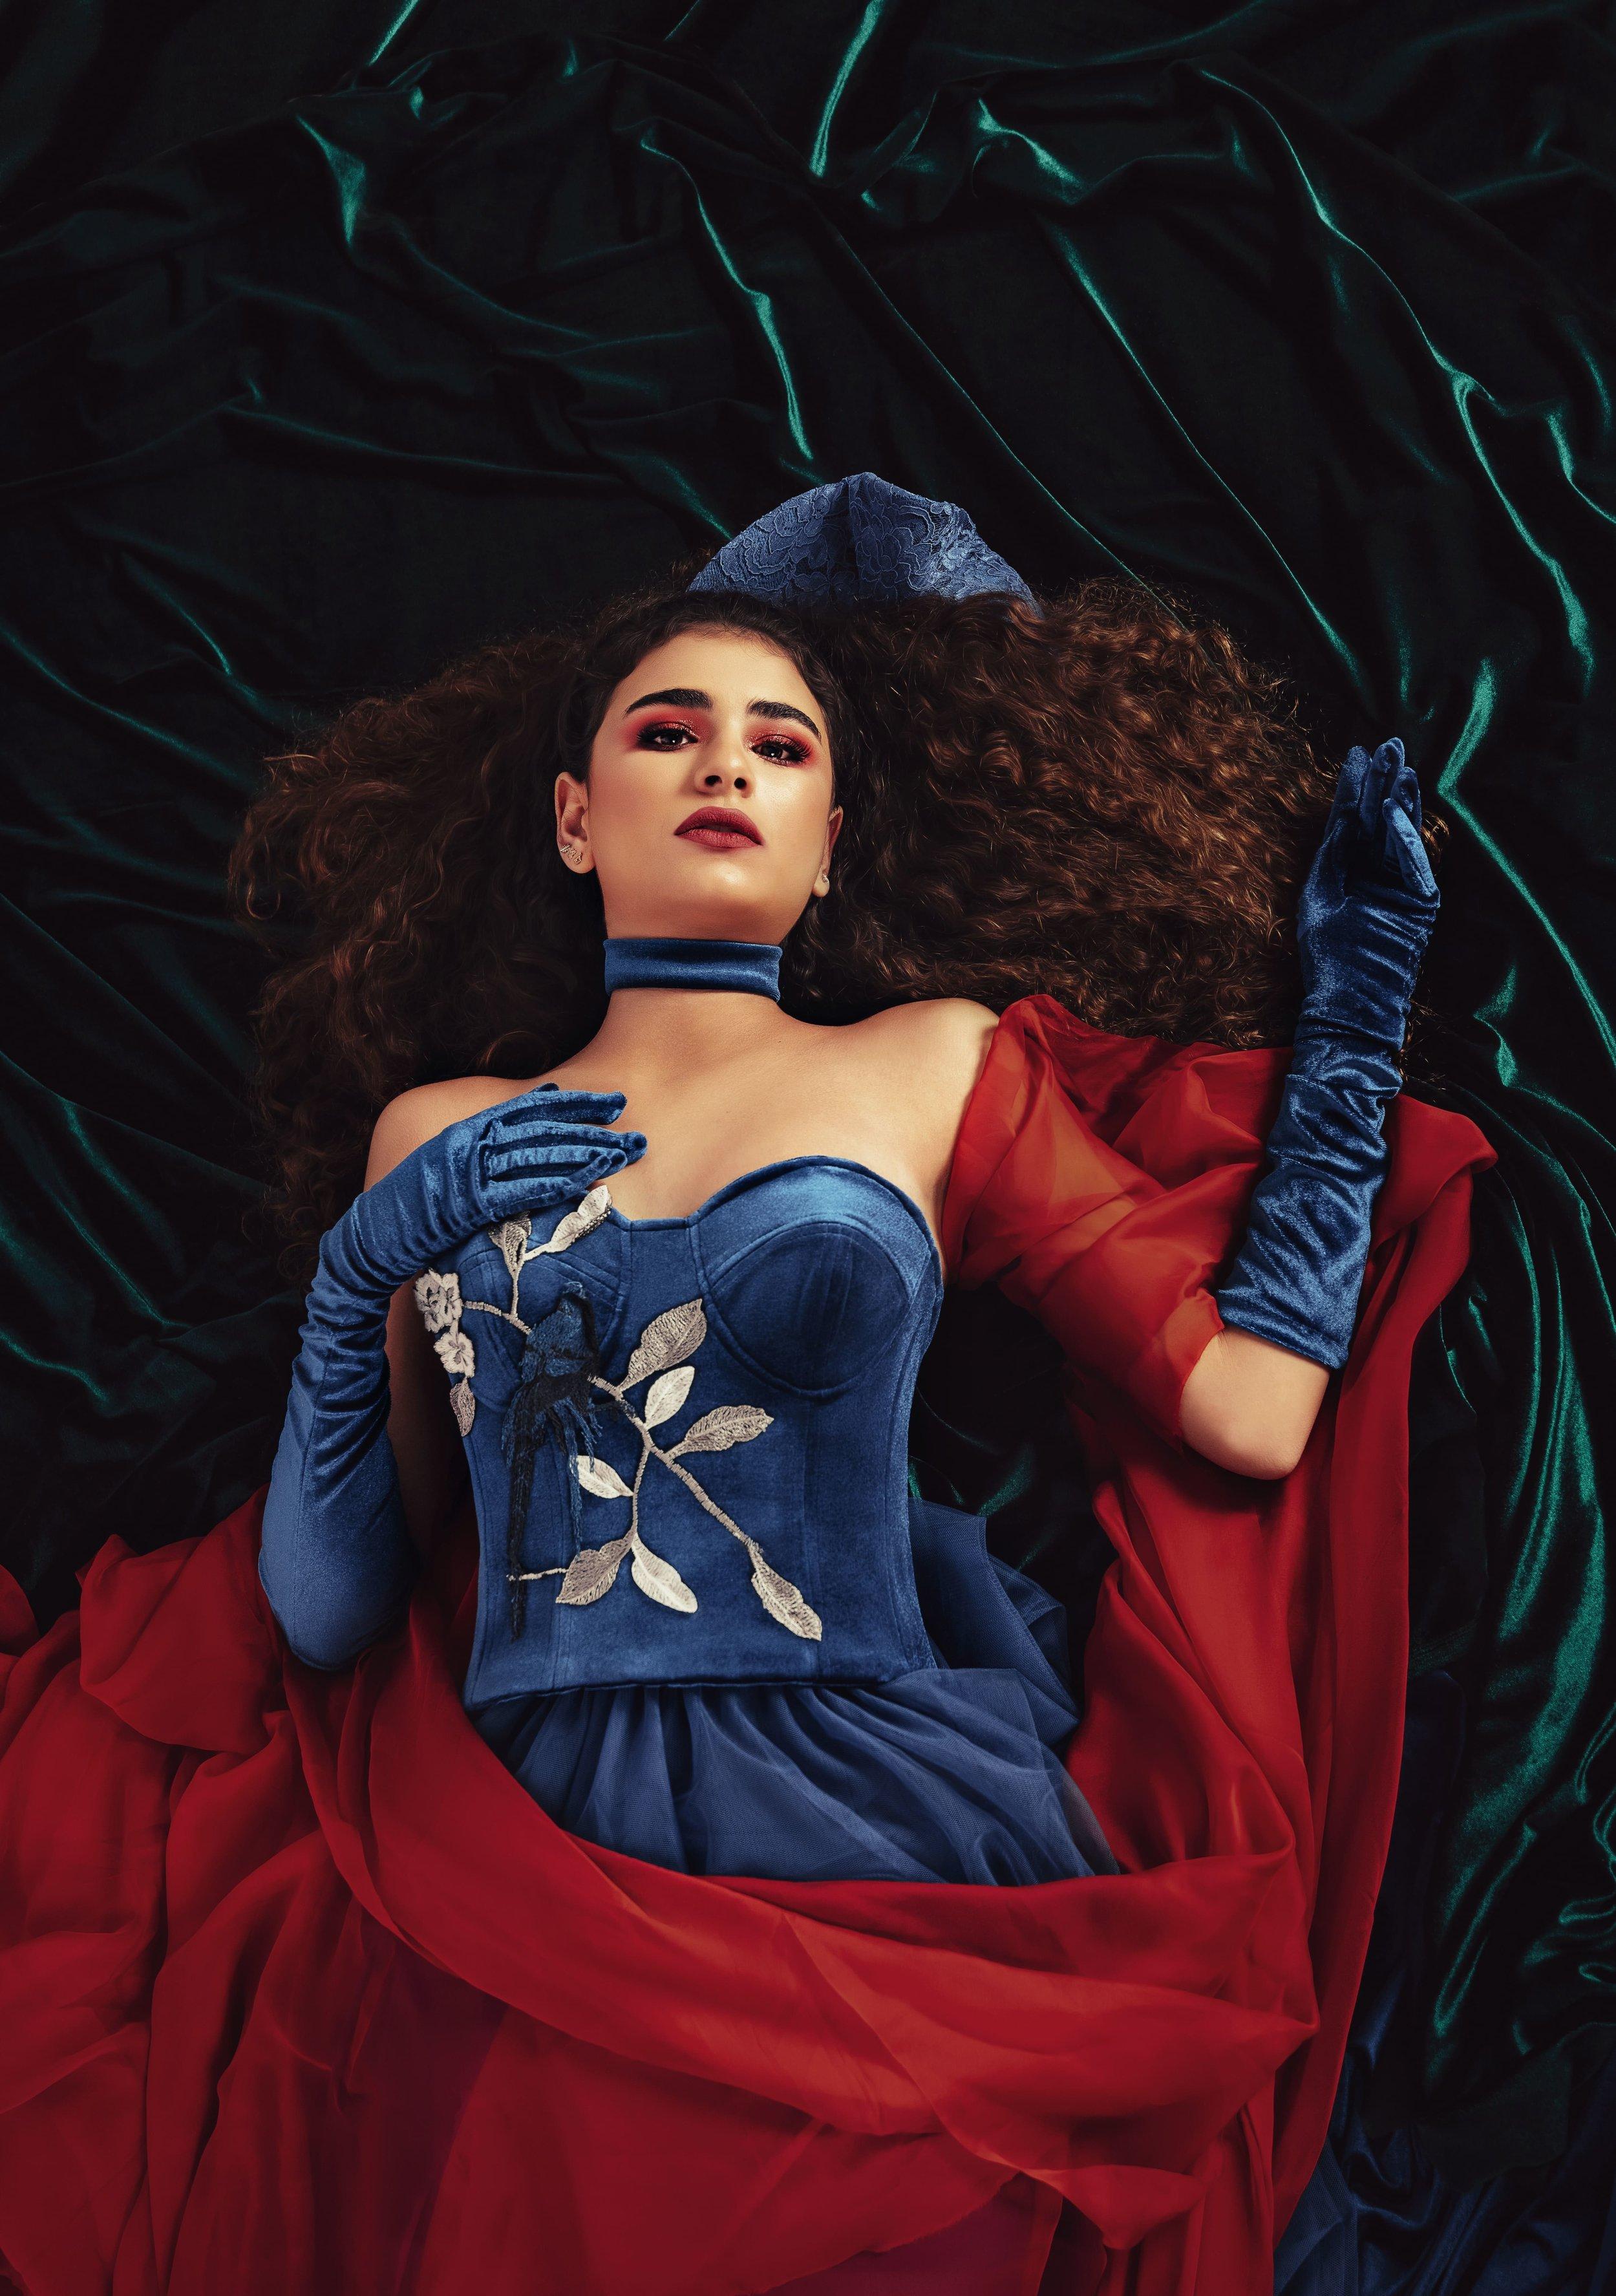 2.Velvet - Berni Palumbo, a Wedding Photographer in the Berkshire, Surry and Oxfordshire area says,